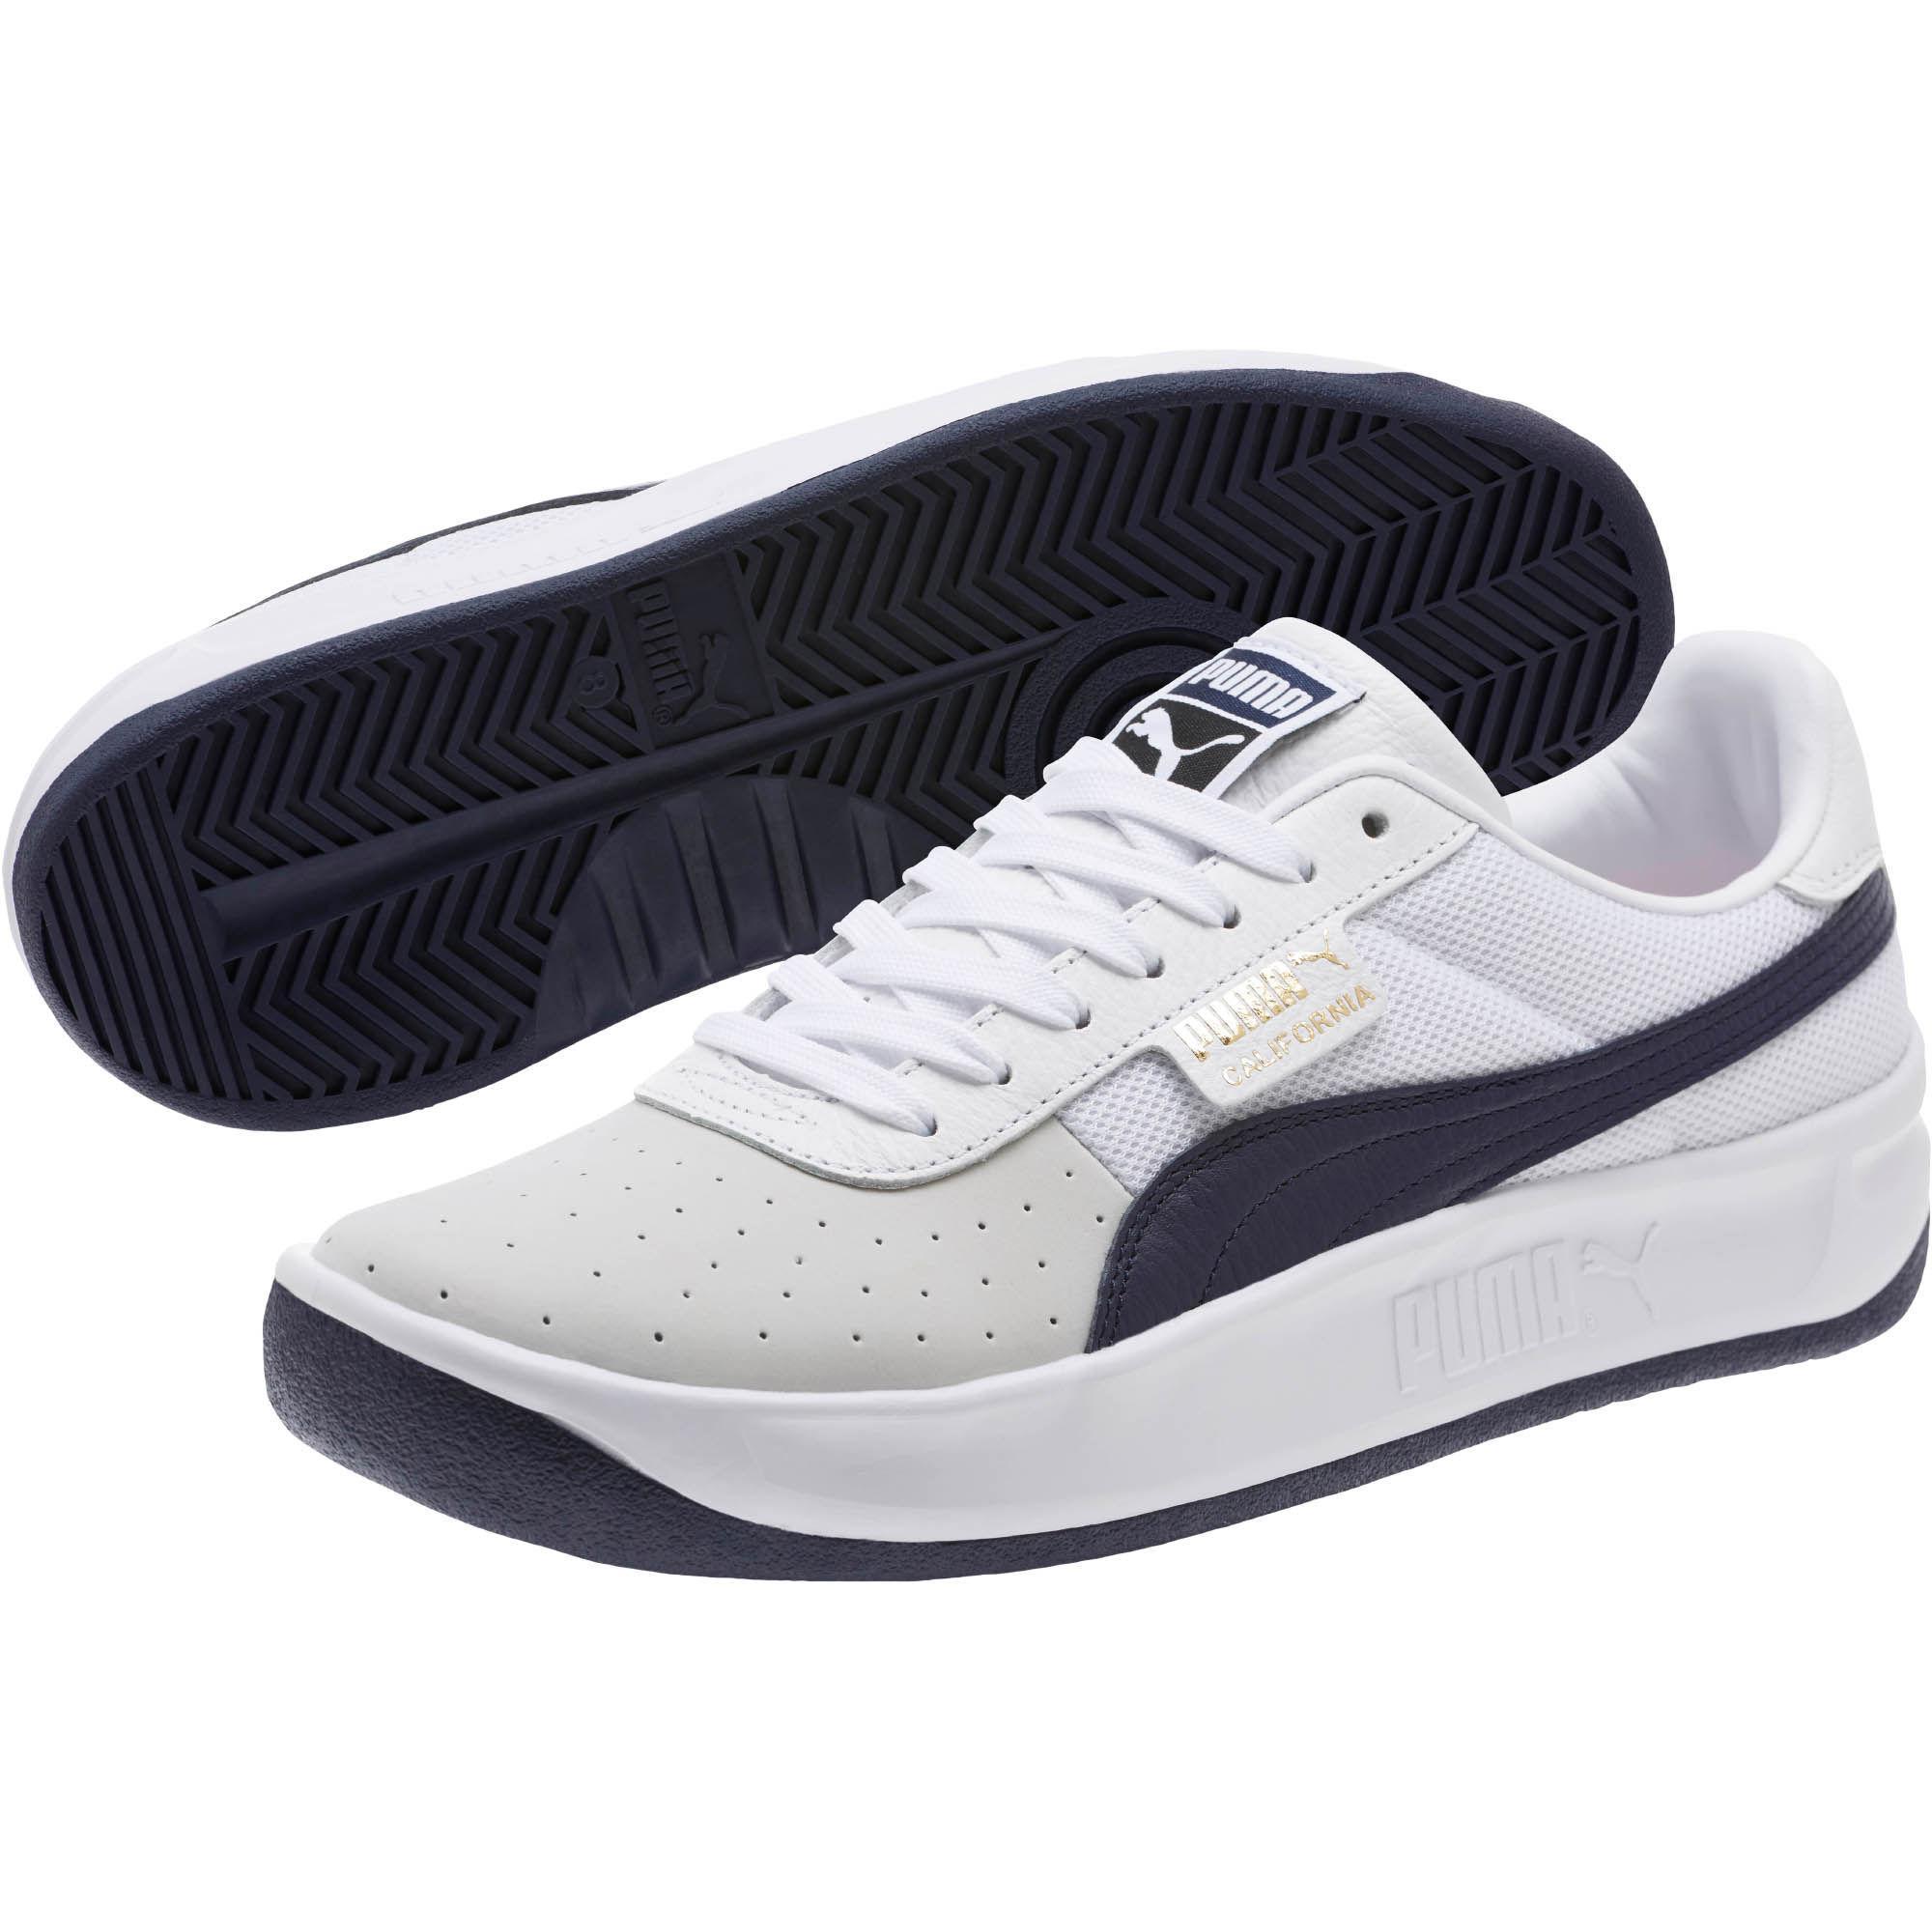 26ebee426175 PUMA - White California Casual Sneakers for Men - Lyst. View fullscreen